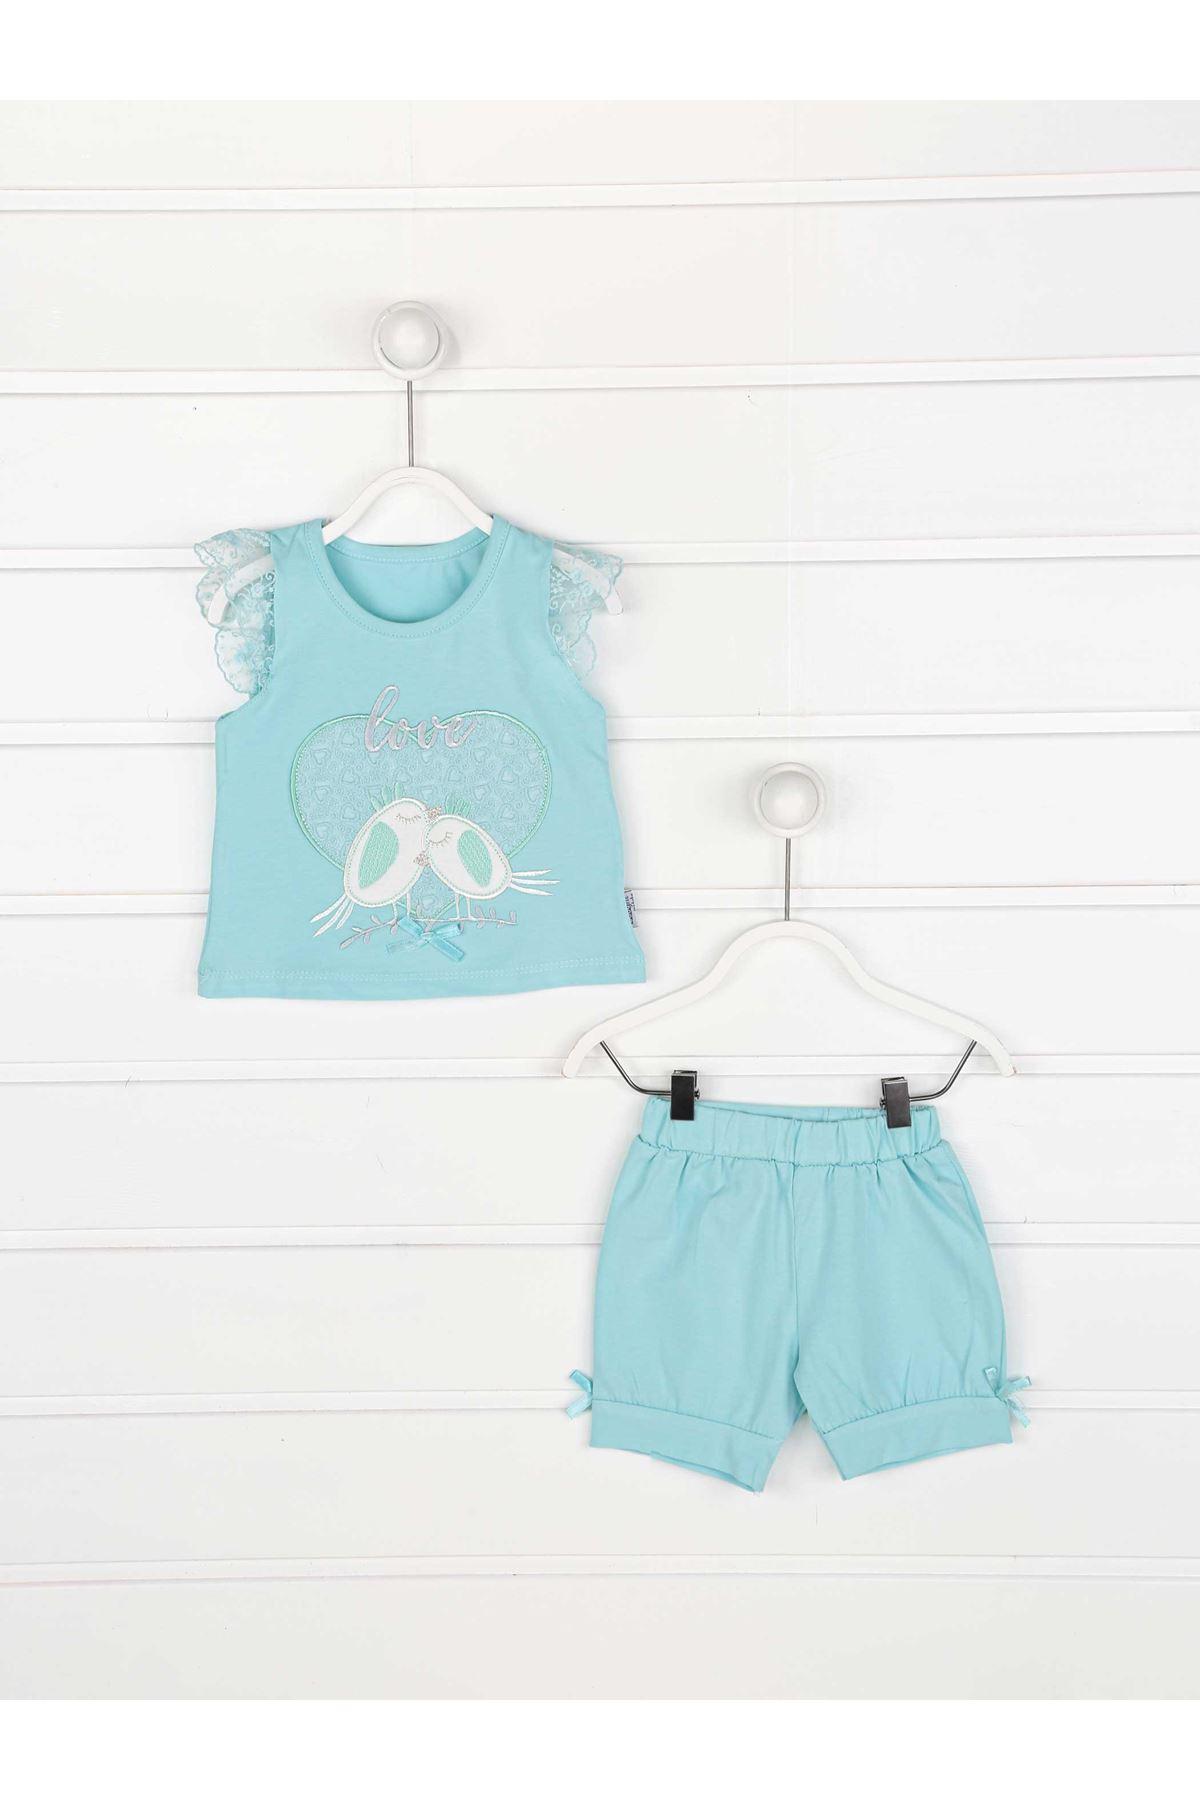 Green Summer baby girl set bottom tights t-shirt 2 pieces bottom top babies cotton seasonal models